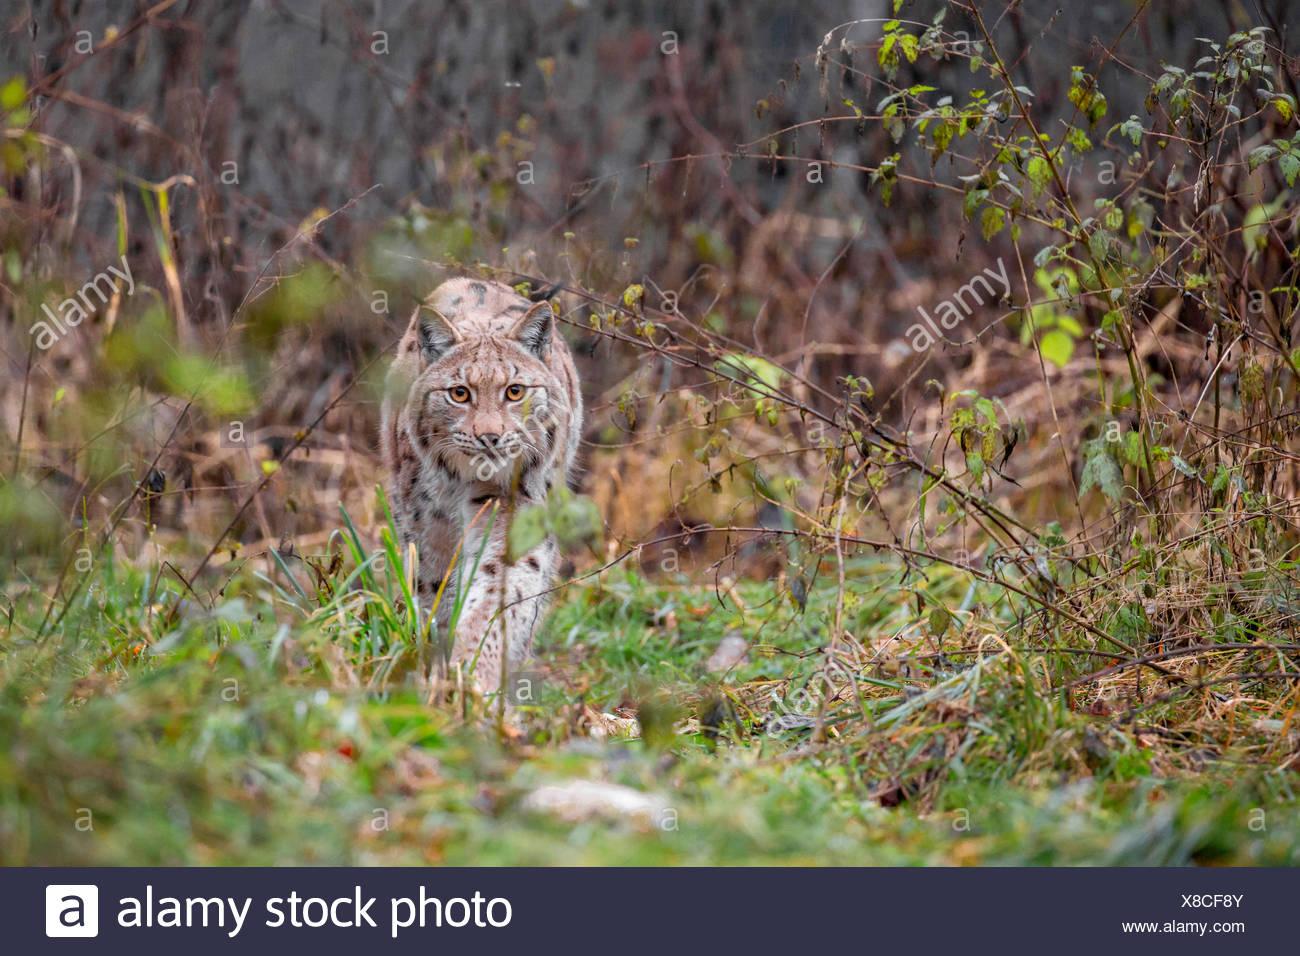 northern lynx (Lynx lynx lynx), wandering through its territory - Stock Image